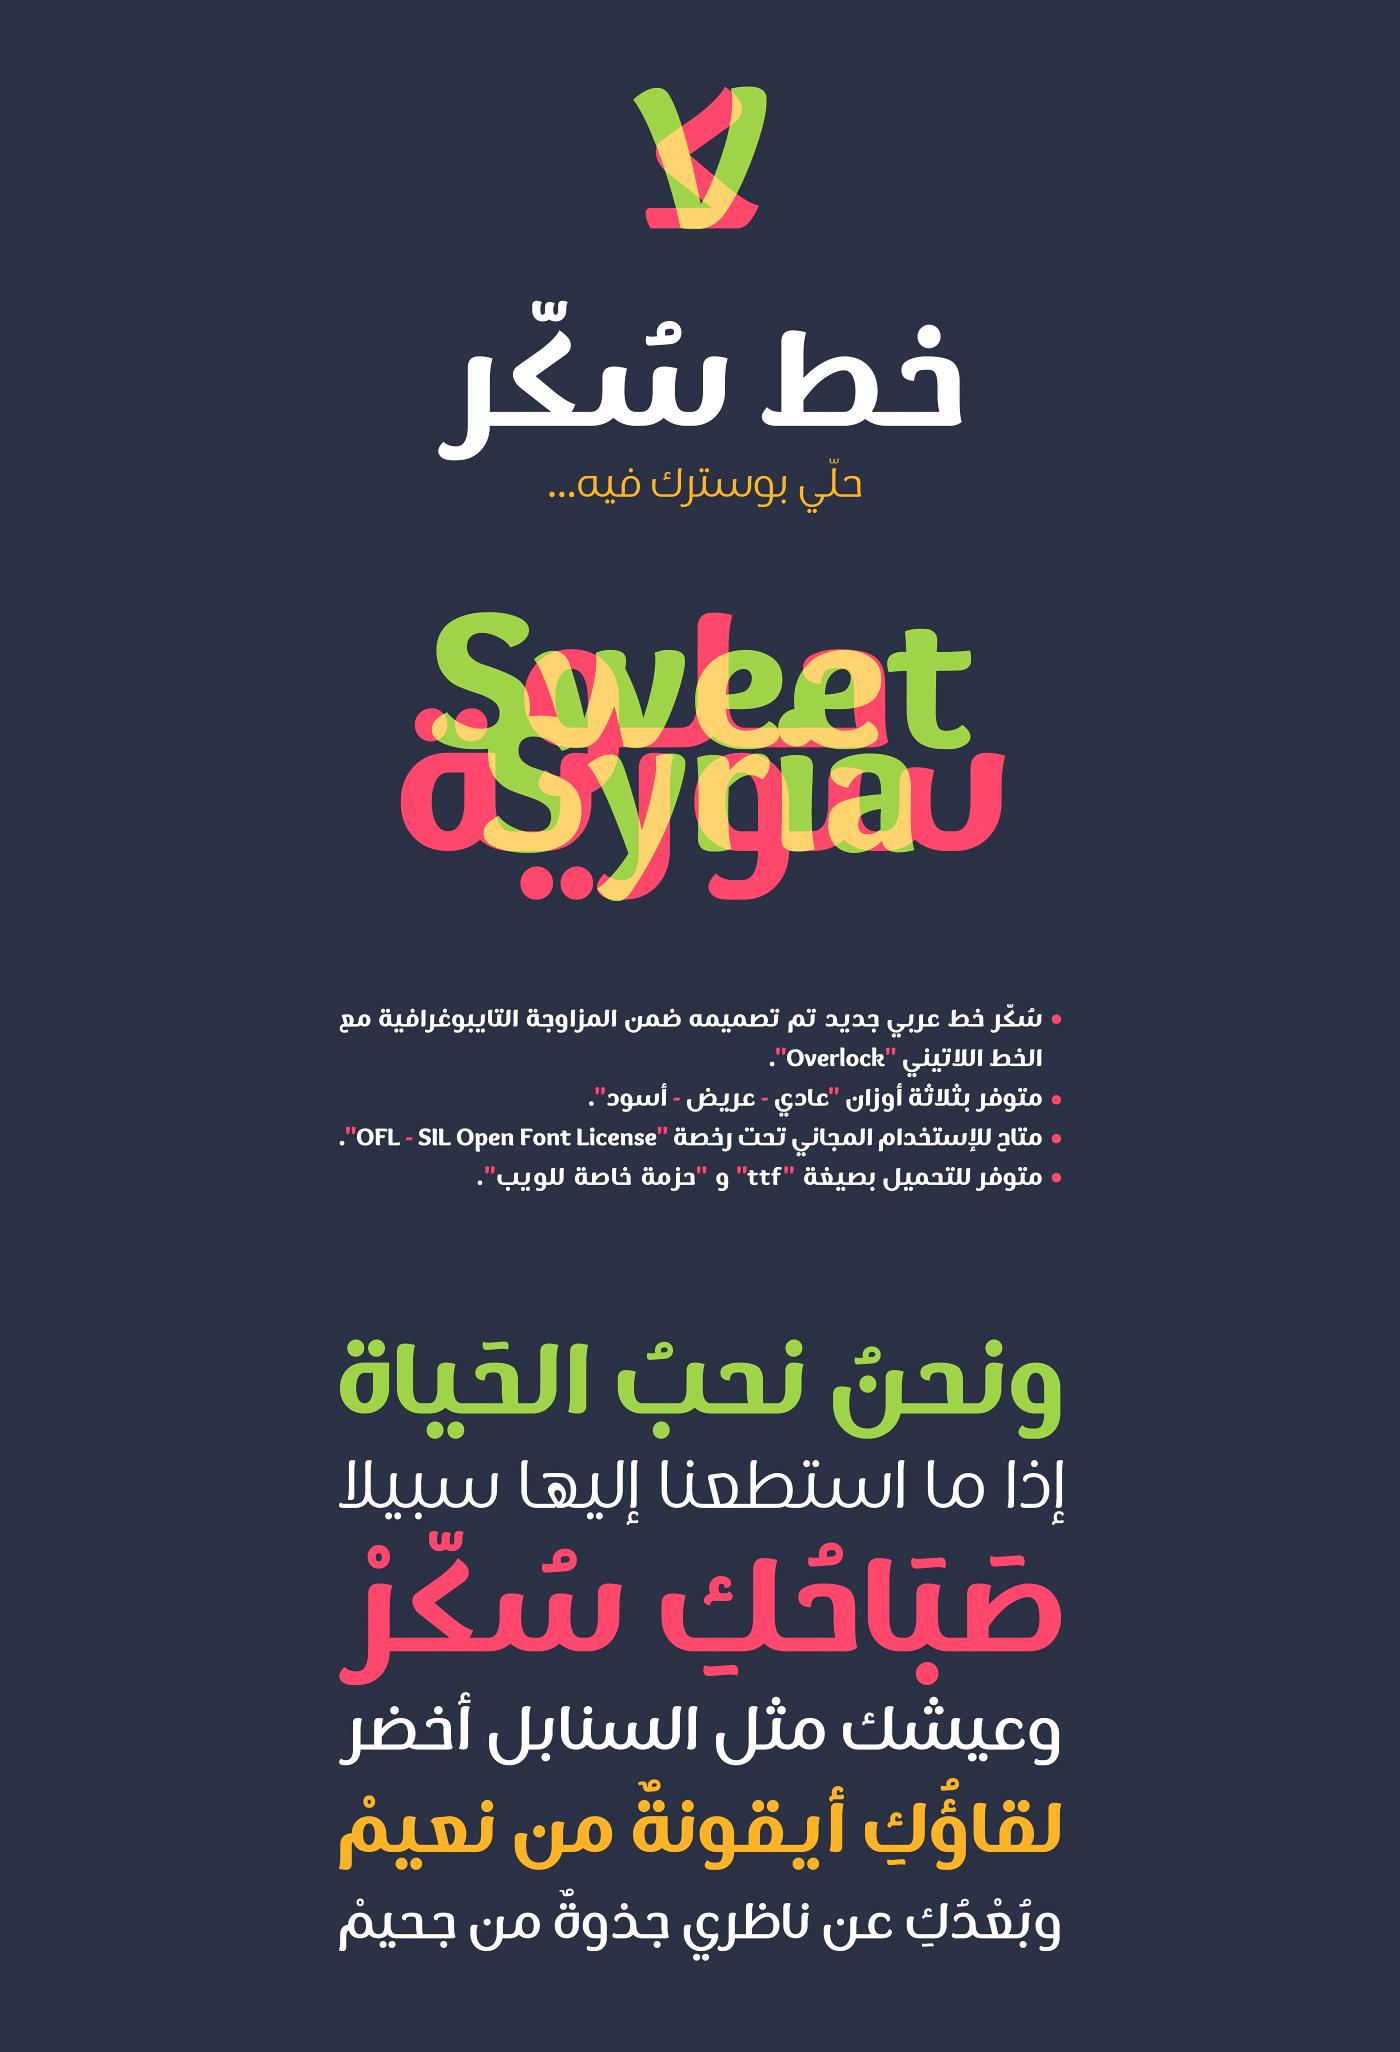 Sukar Typeface Arabic Overlock Typeface Free On Behance Typeface Overlocker Typography Design